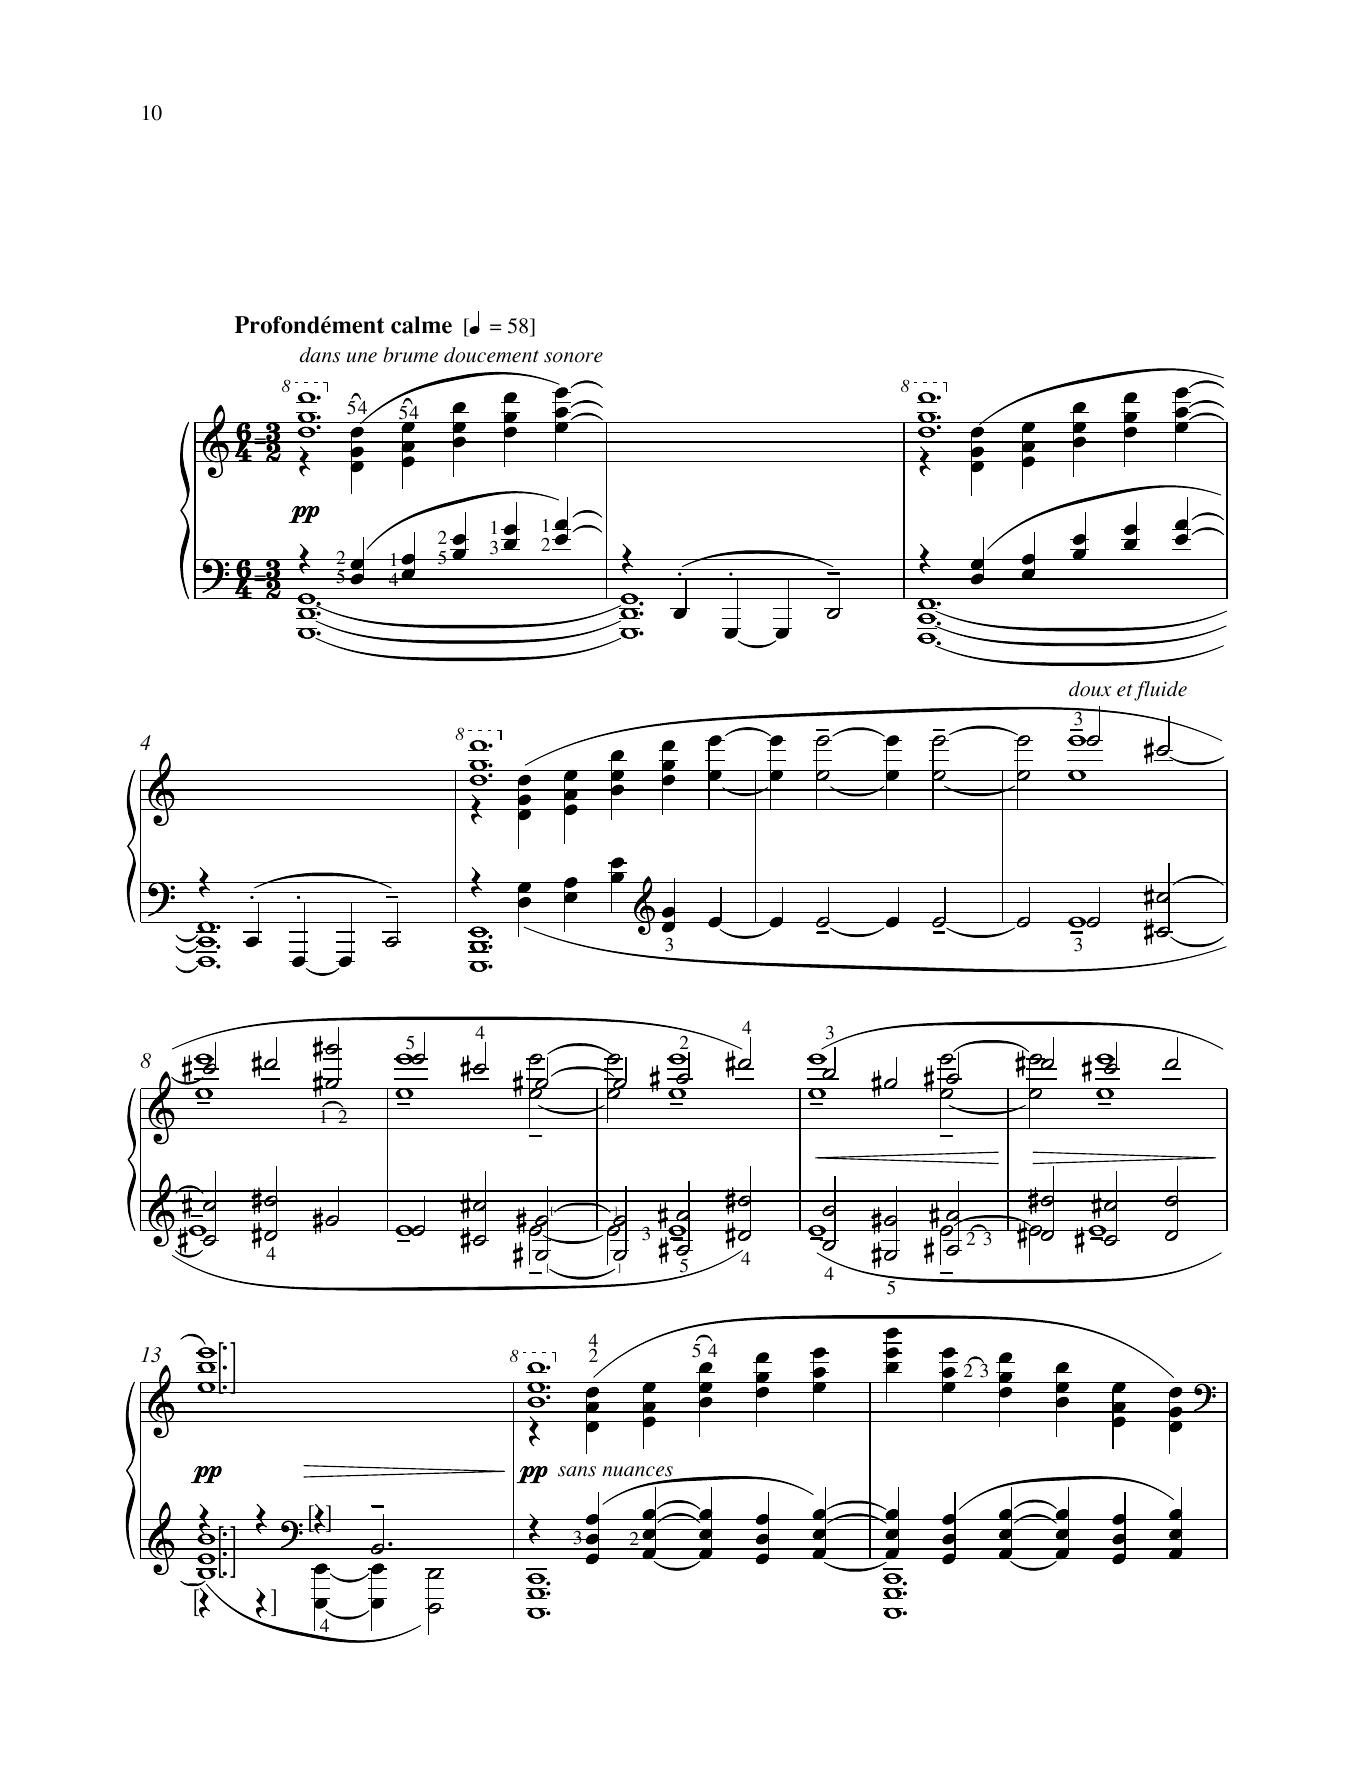 La cathédrale engloutie Sheet Music